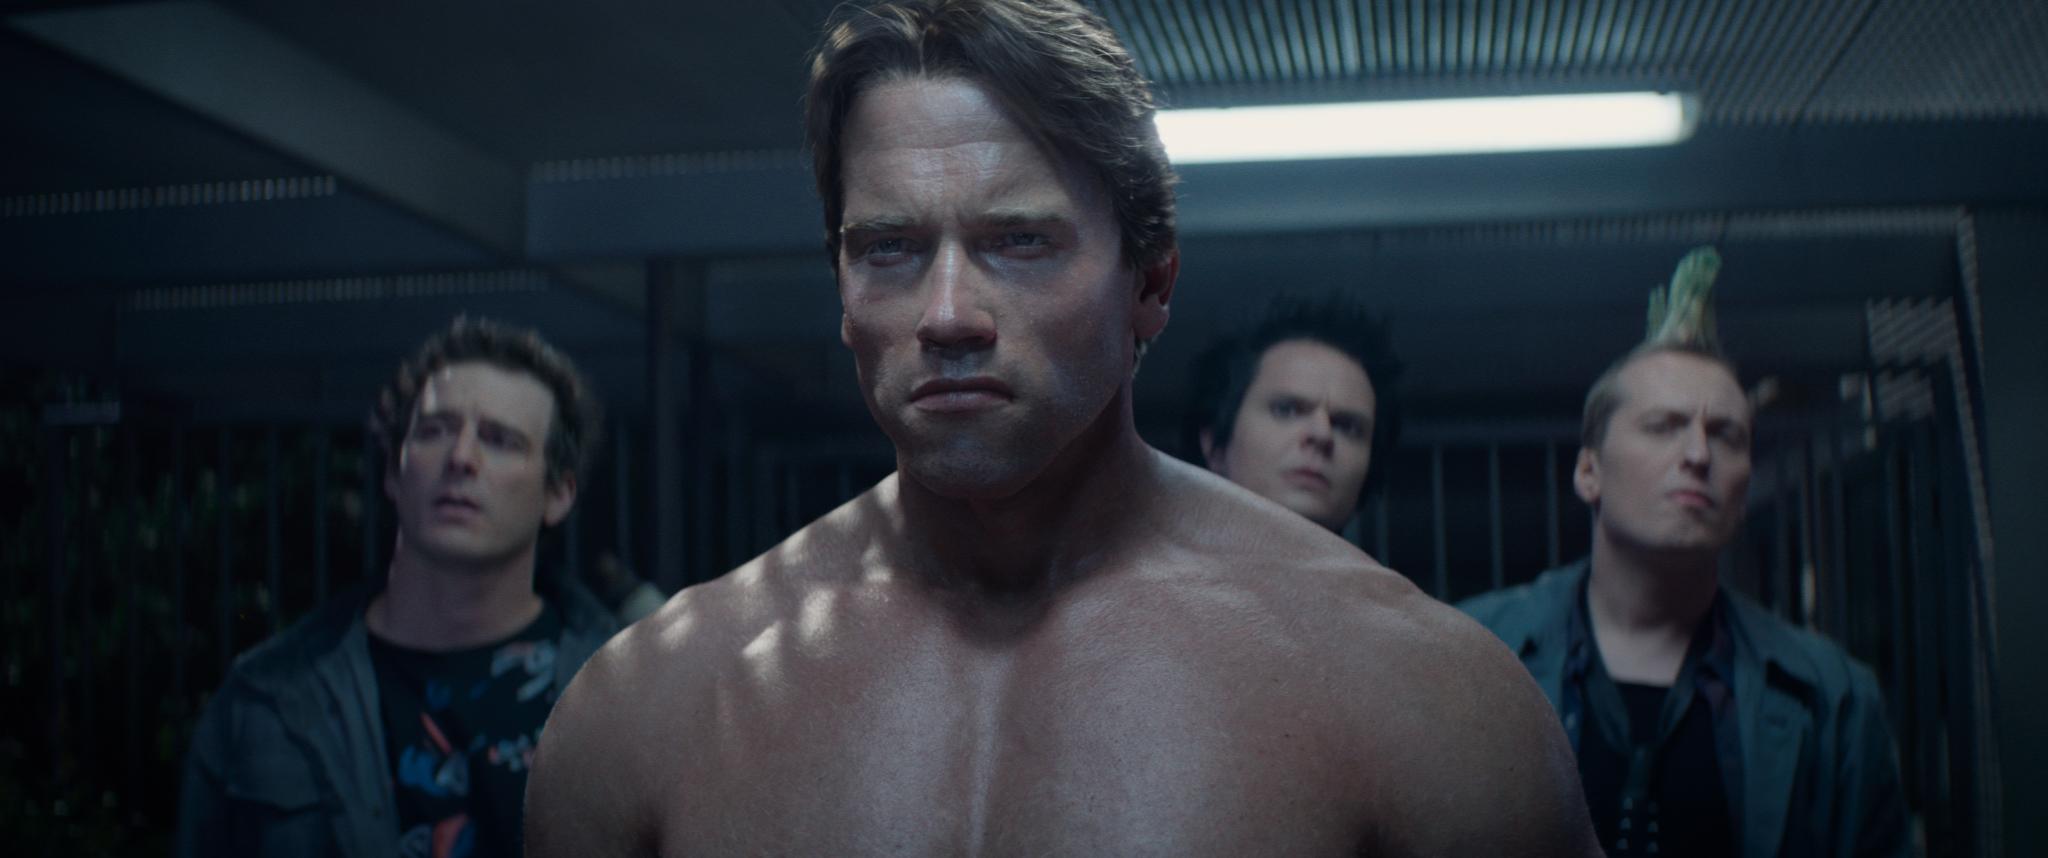 Still of John Edward, Luke Sexton and Edward Lee in Terminator Genisys (2015)